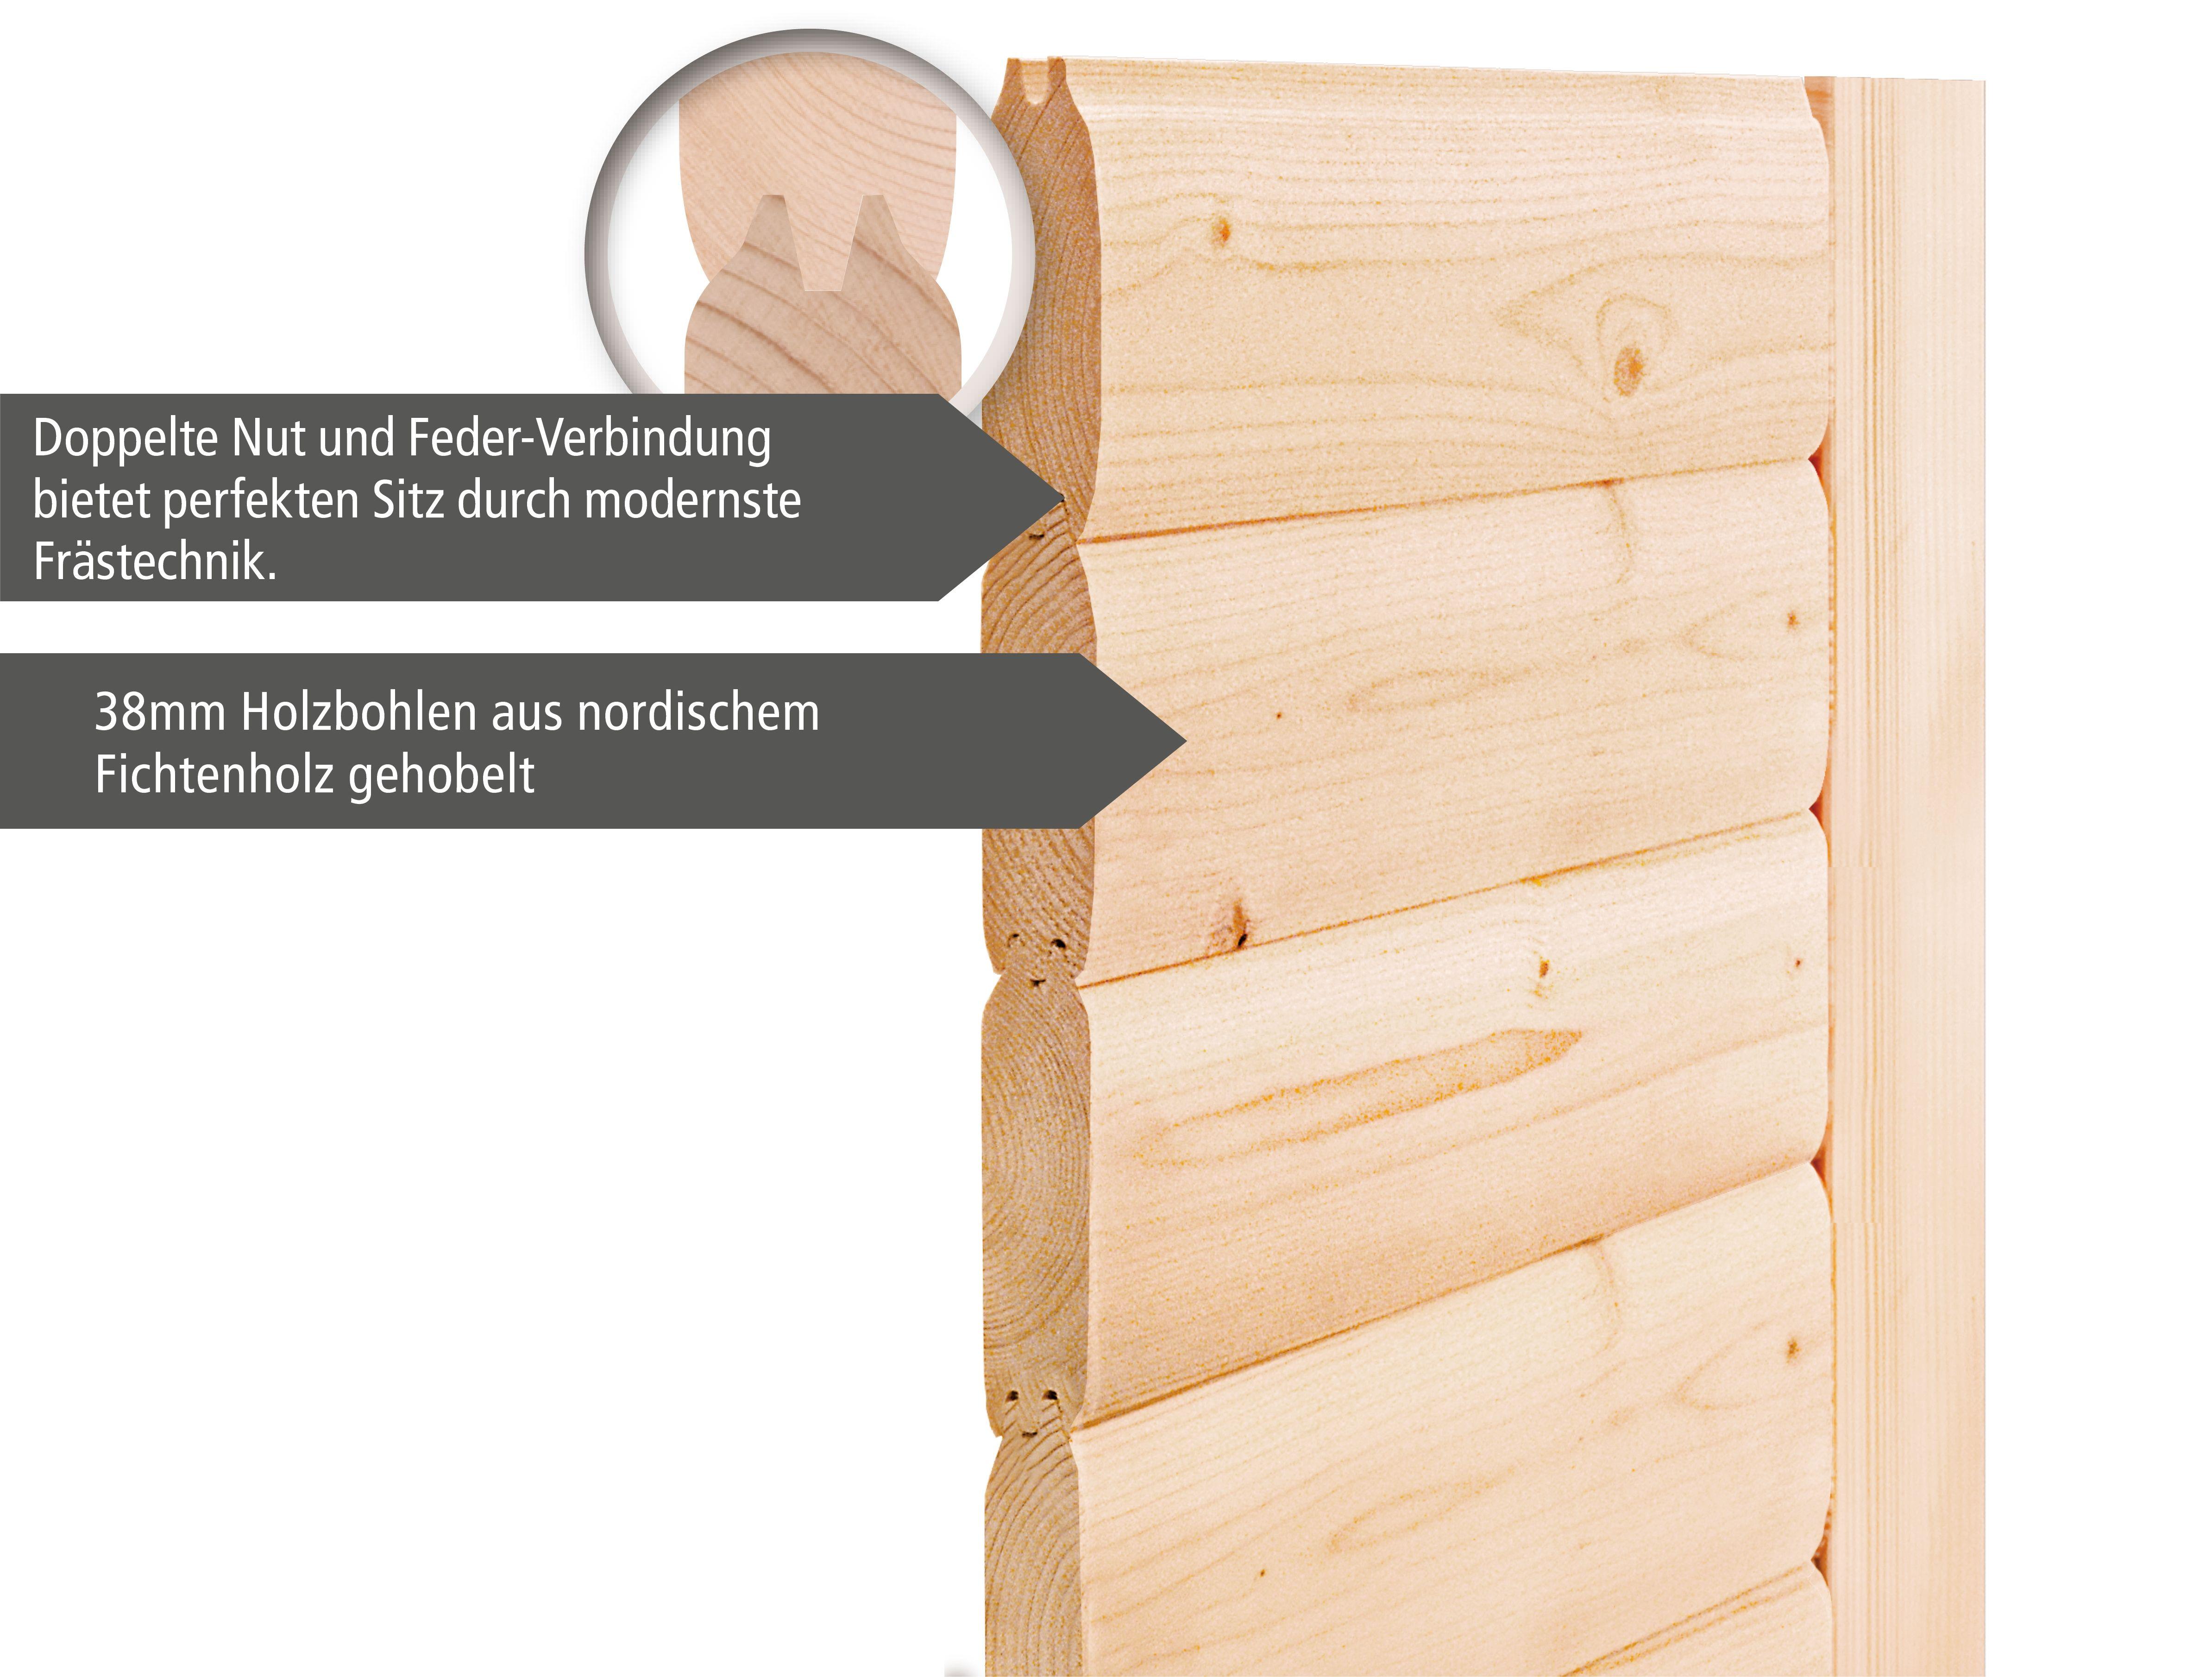 Woodfeeling Sauna Jara 38mm ohne Saunaofen Bild 5